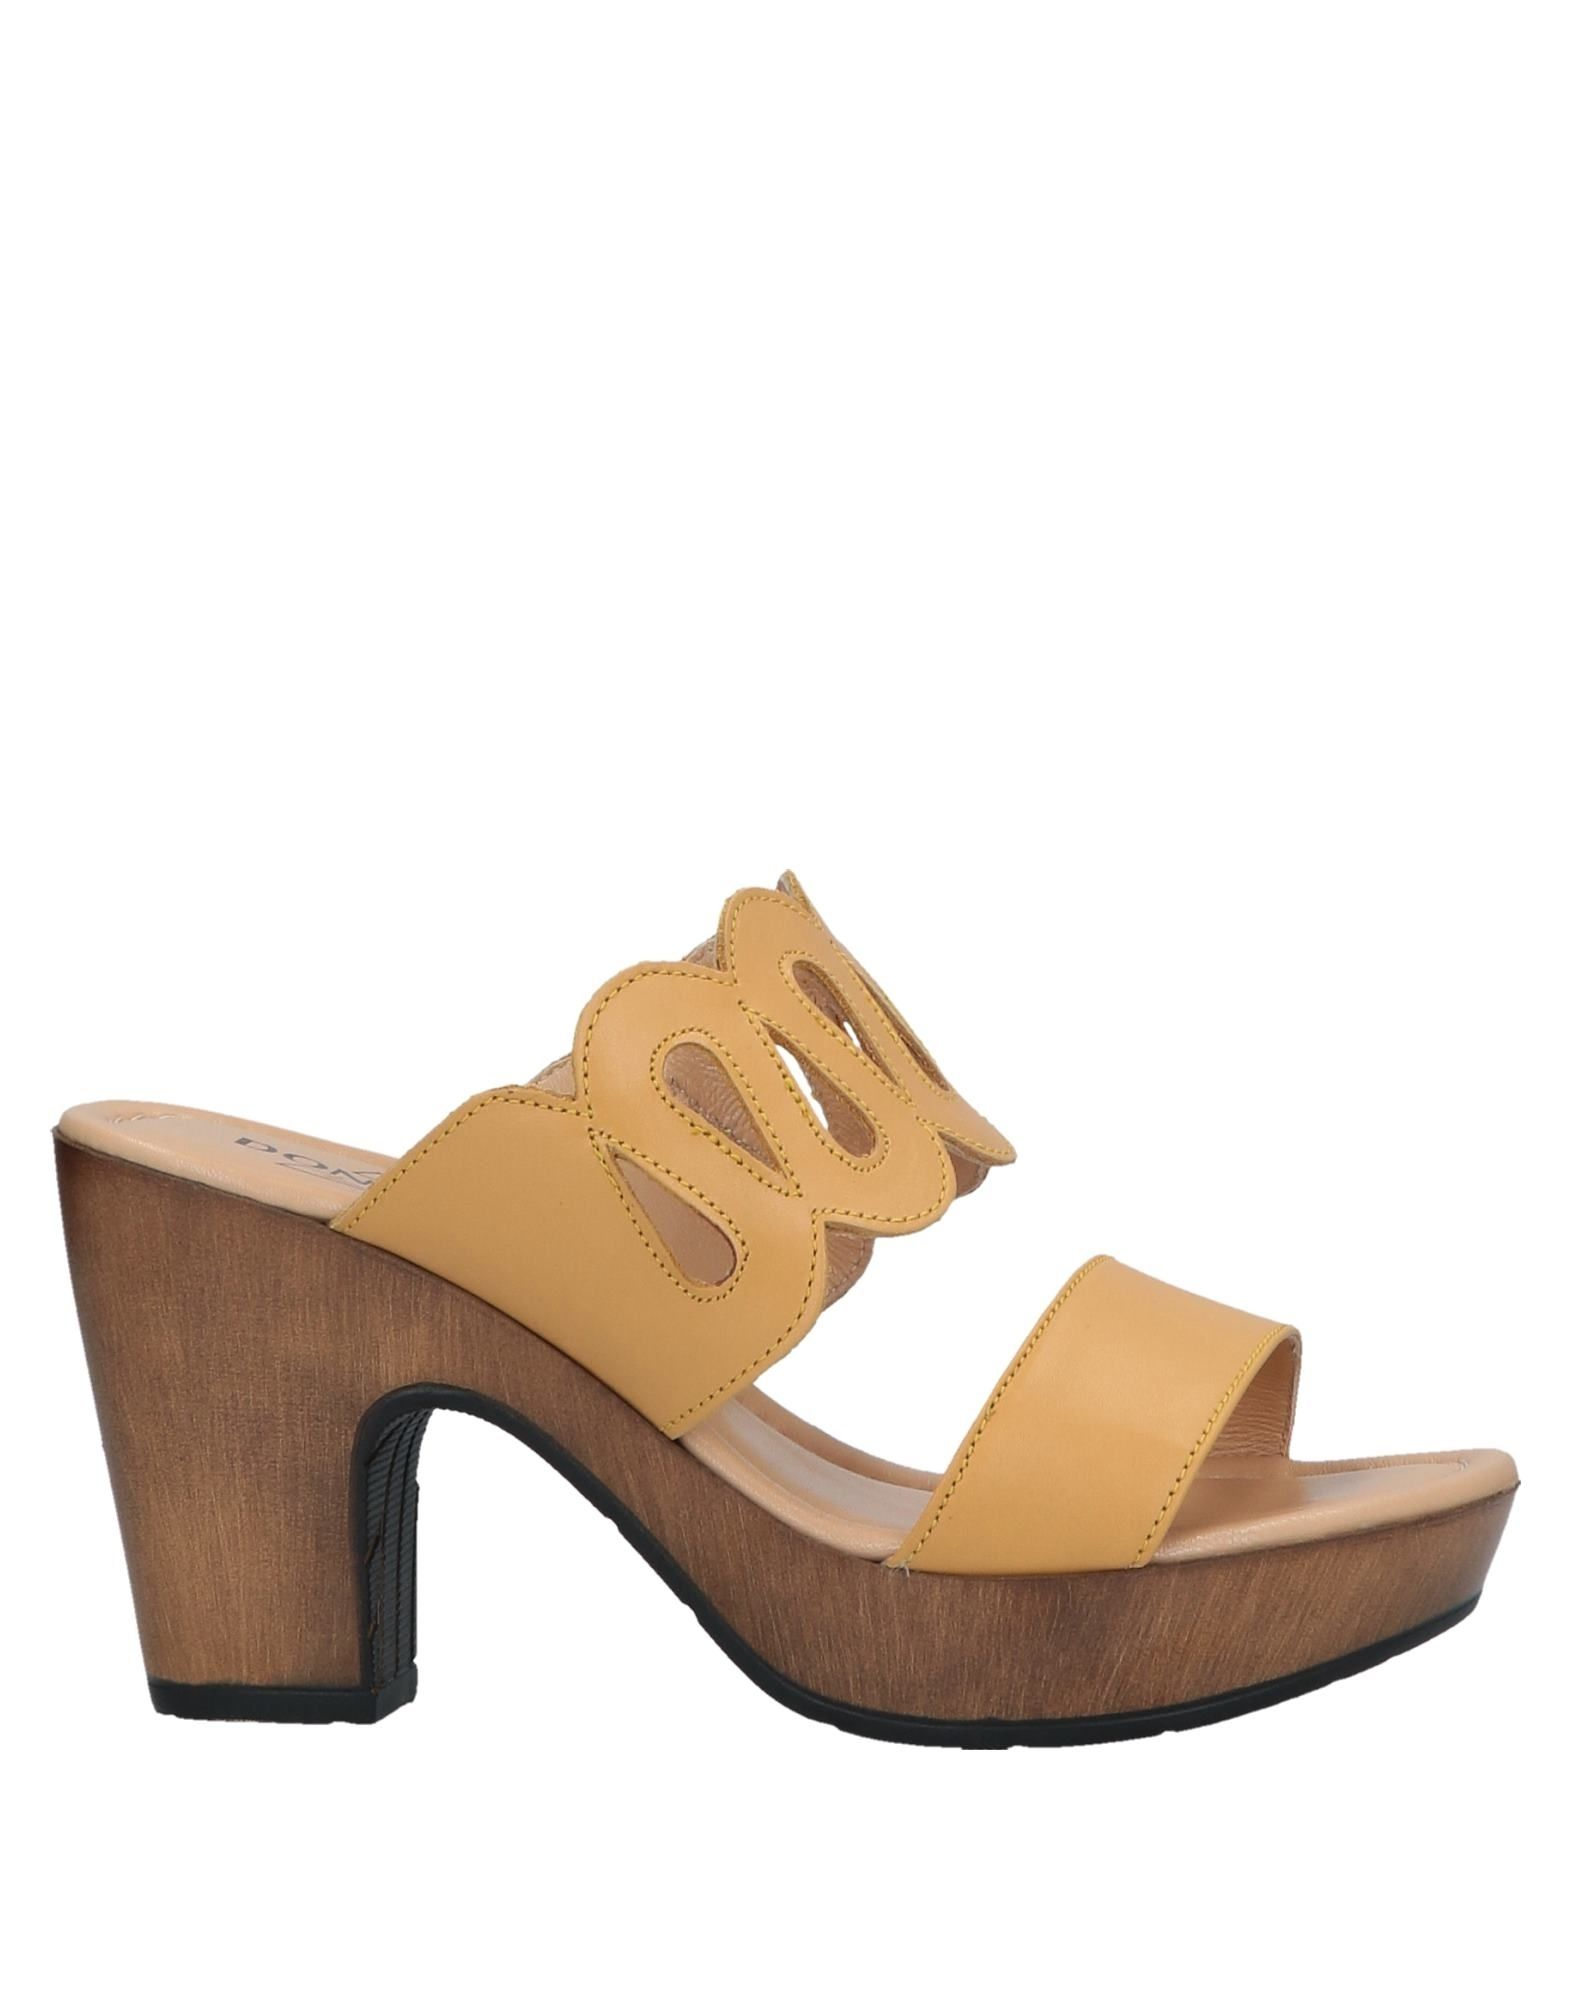 Sandali damen Soft damen - 11632229TT